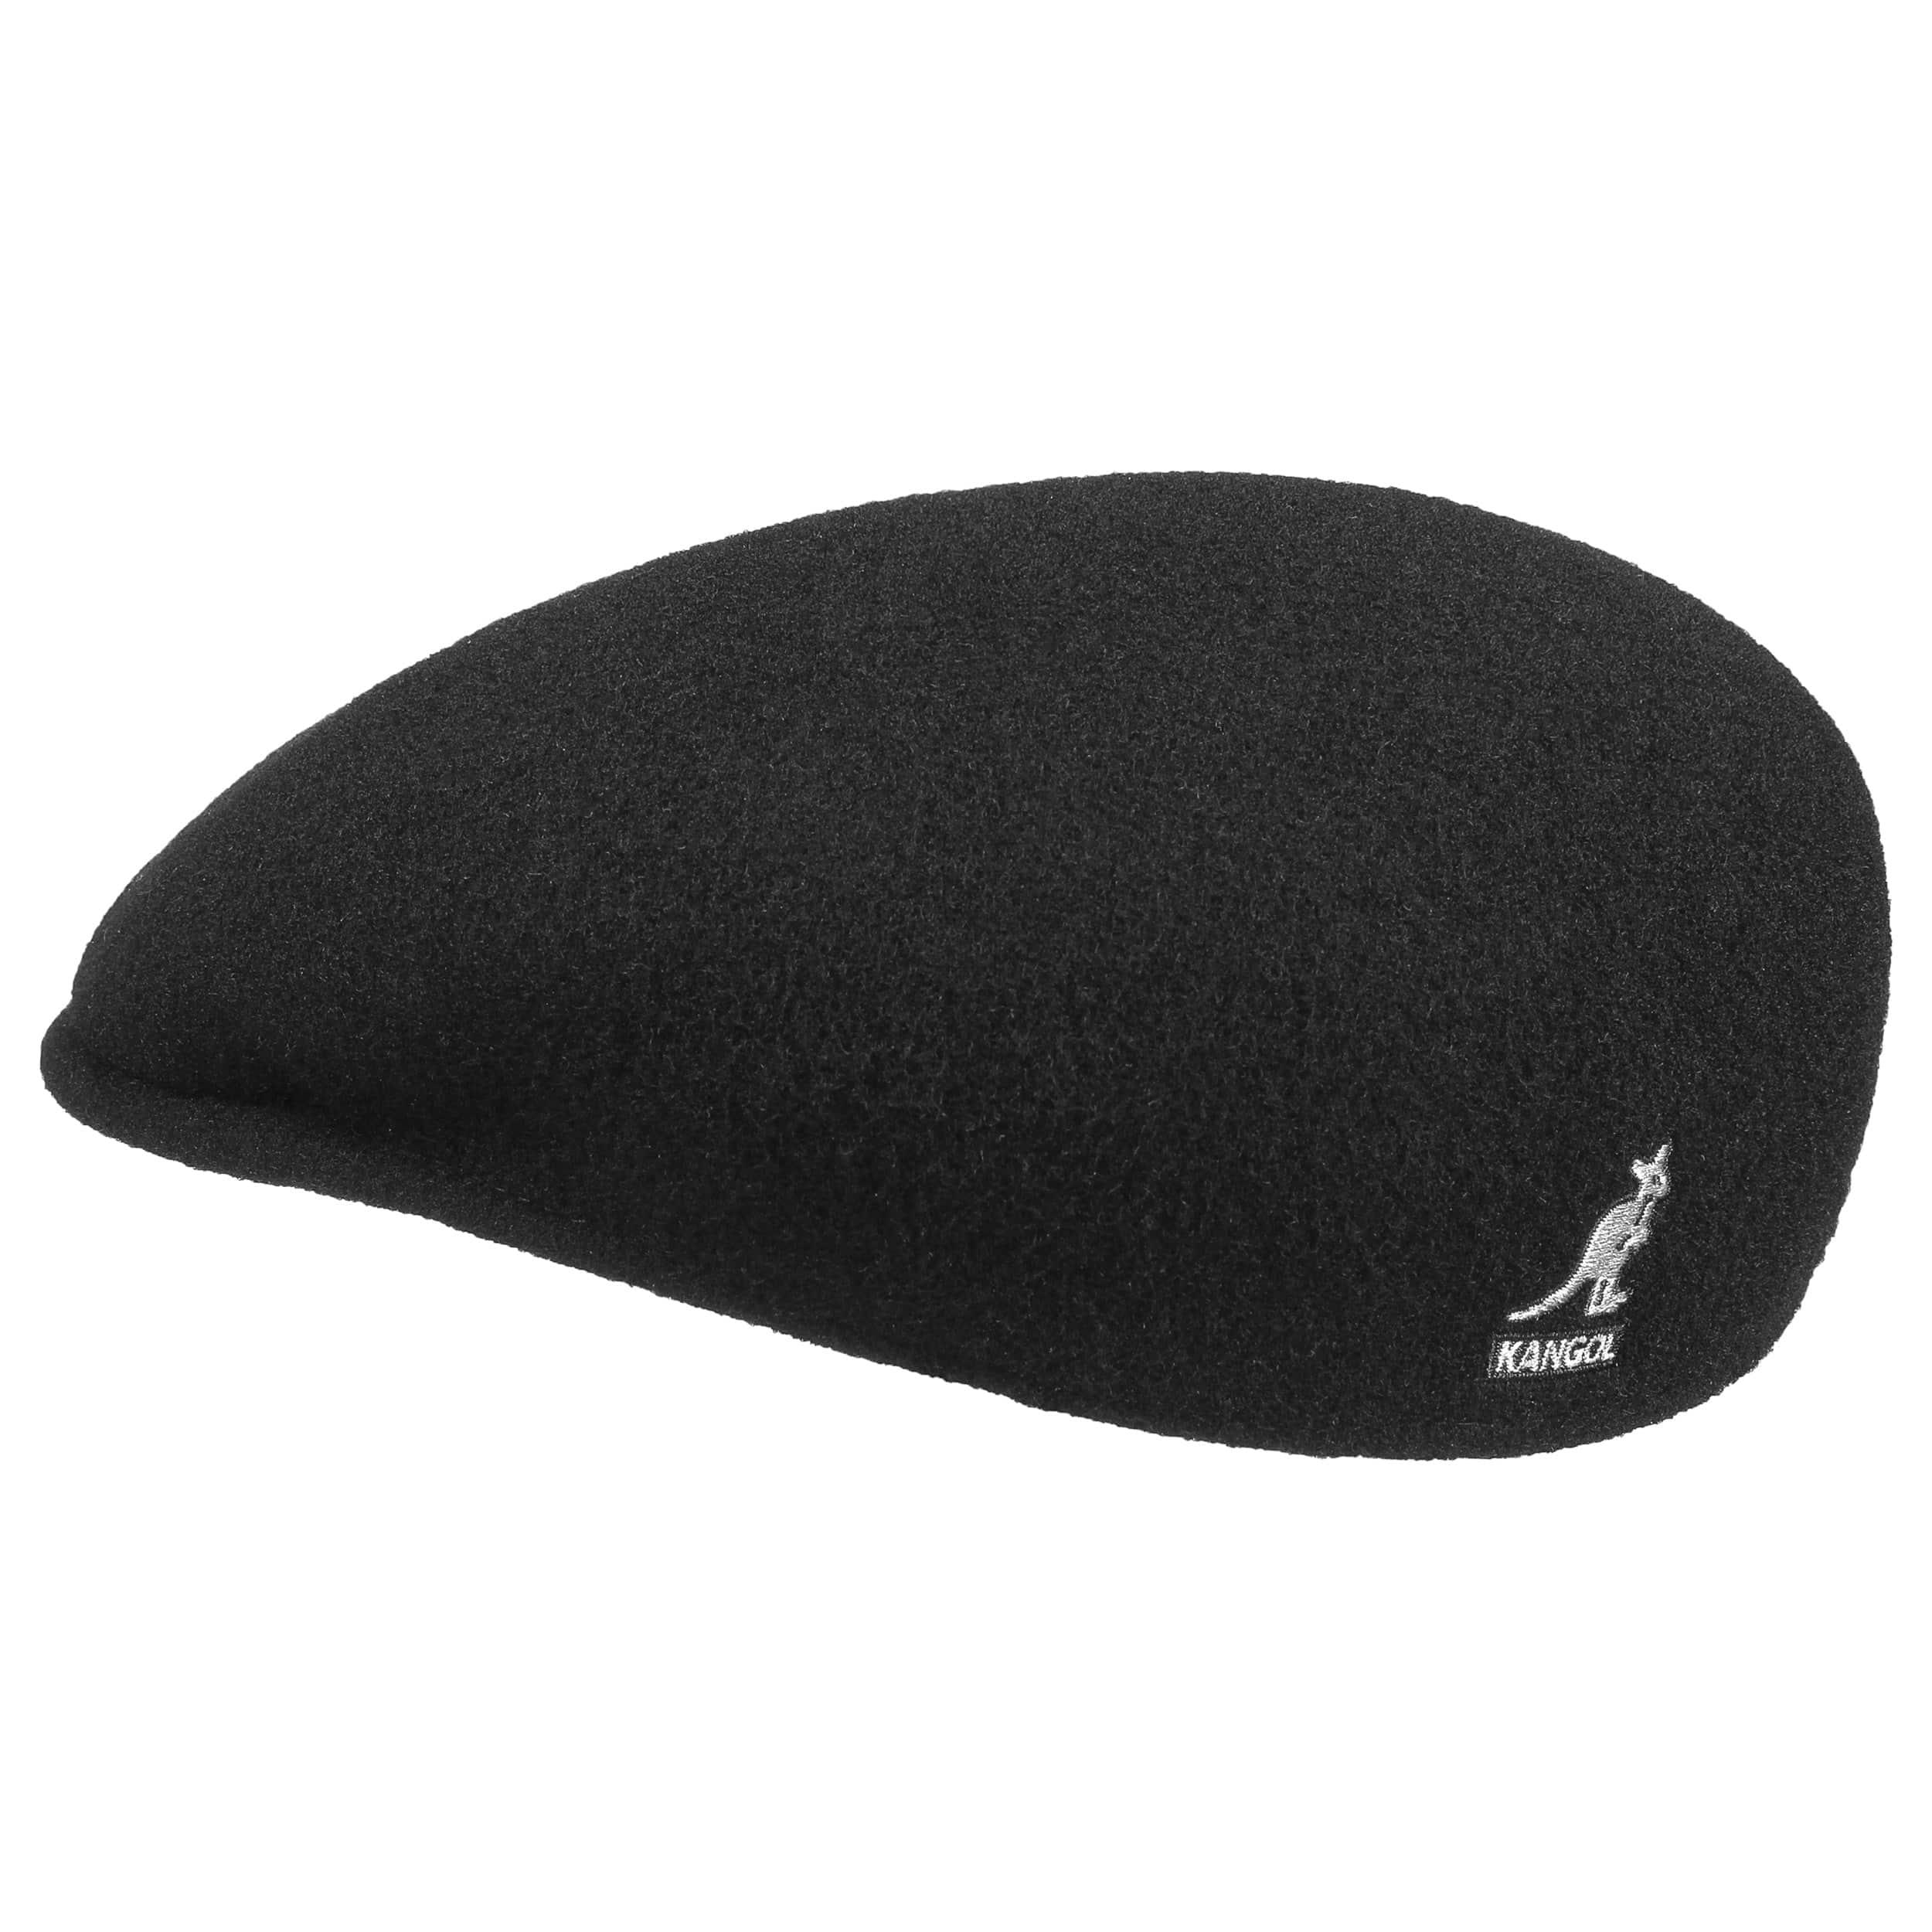 Gorra 504 by Kangol - Gorras - sombreroshop.es 9a1f8689136